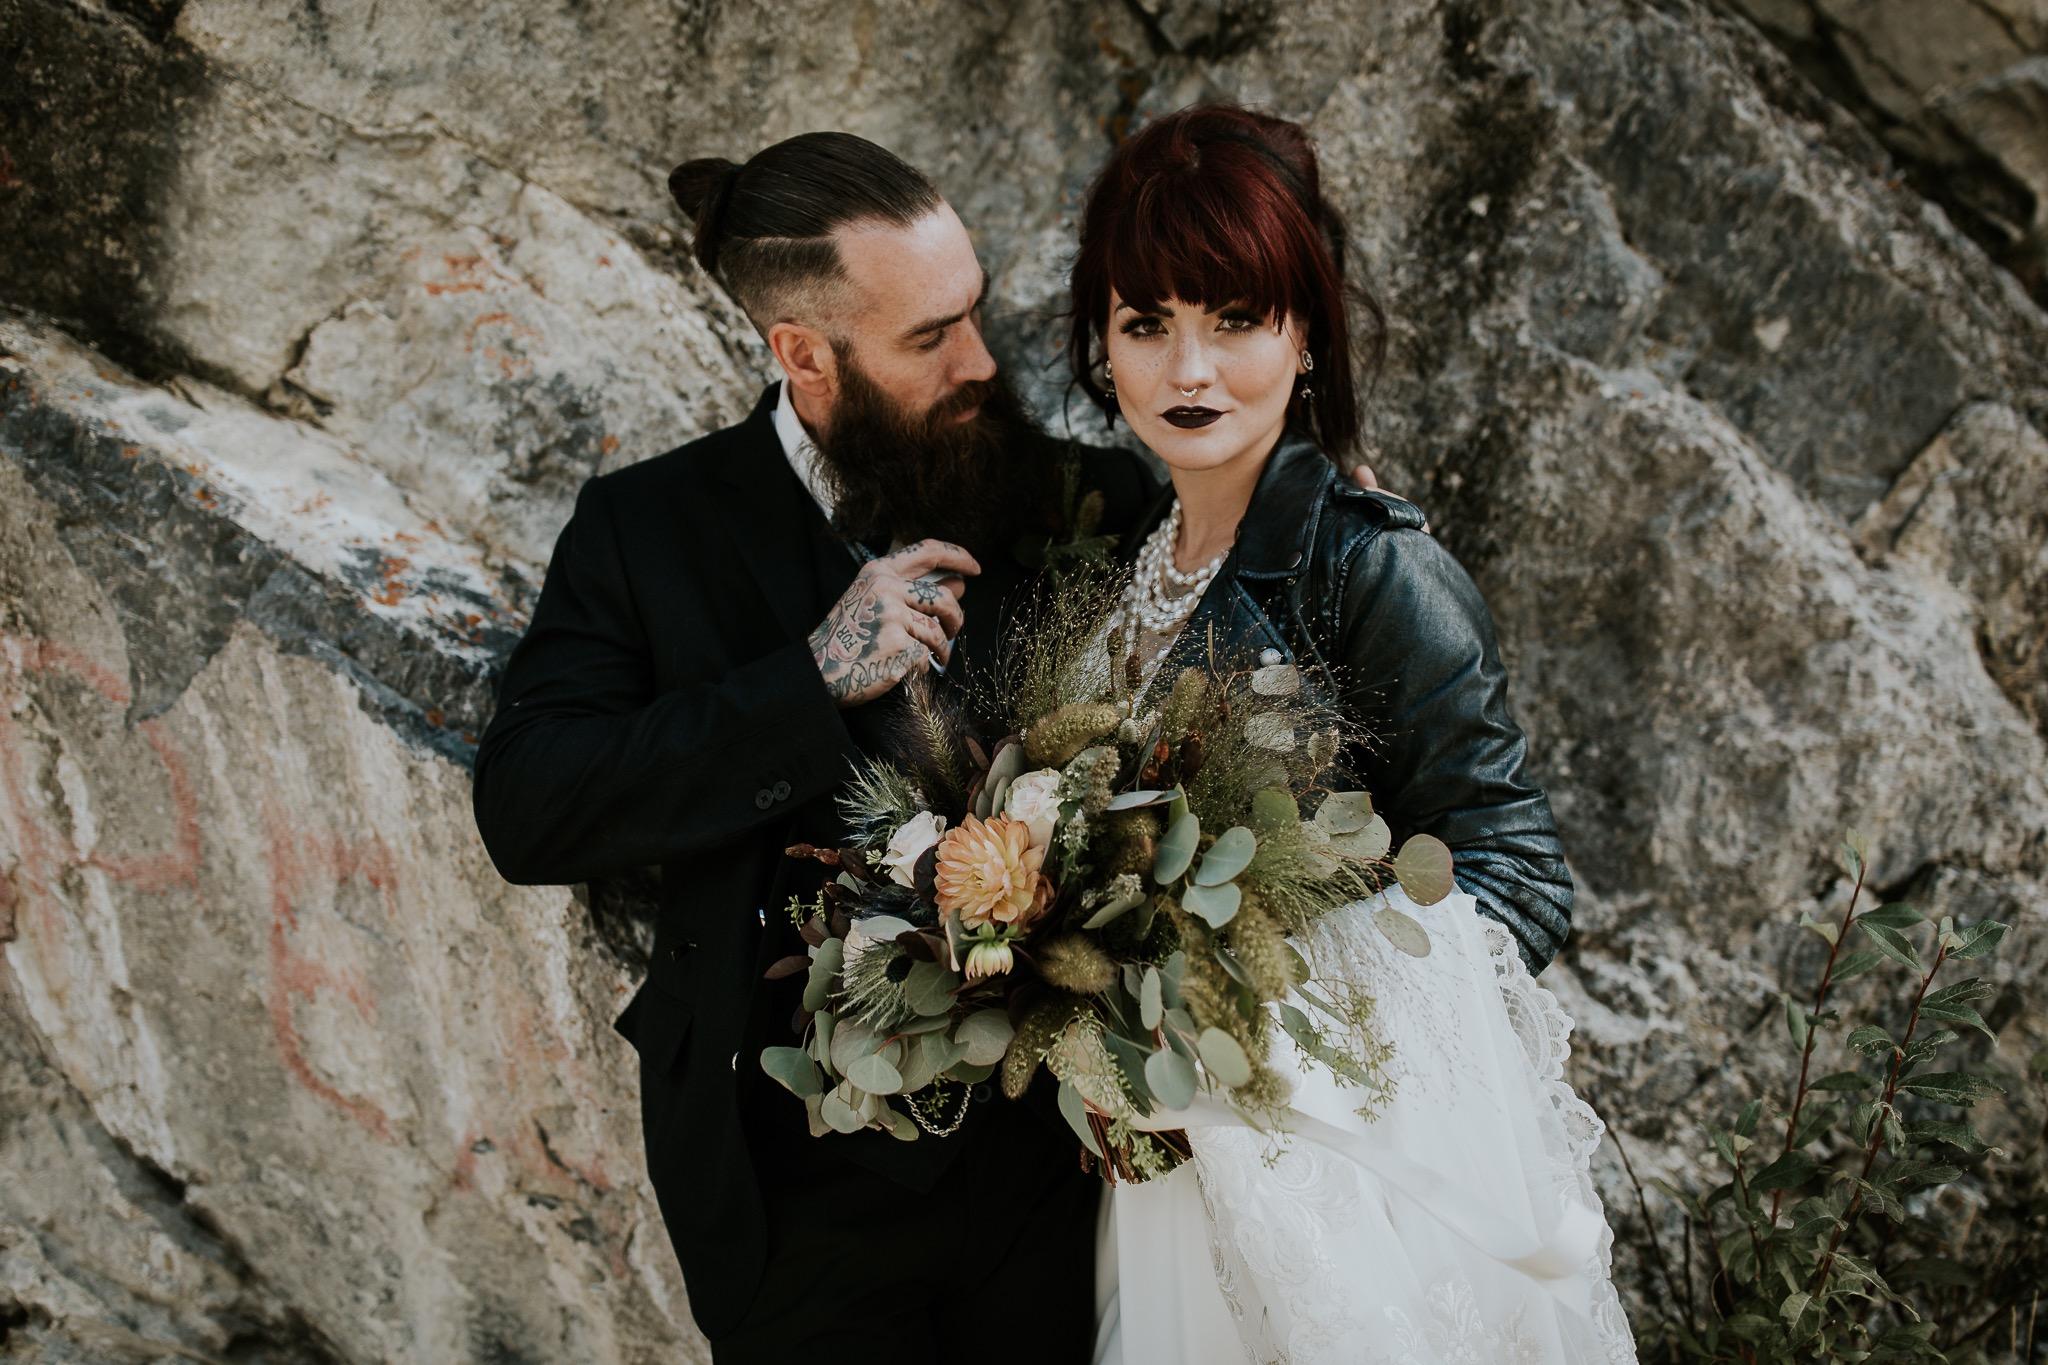 20170915-canmore-moody-wedding-photographer-creekside-creeksidestyledshoot-time&fate-5248